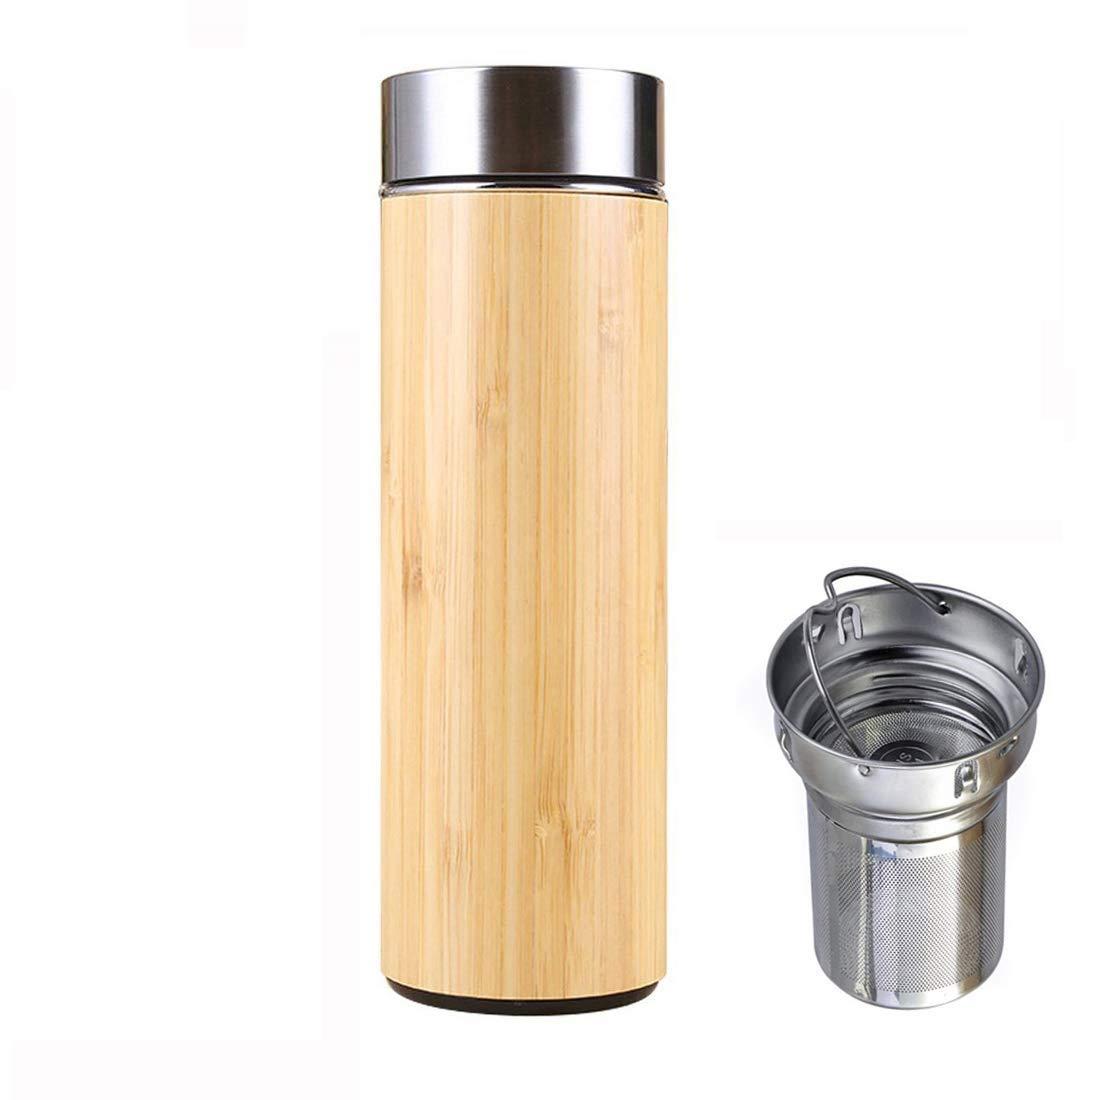 Botella Termica Té Acero Inoxidable Infusor Taza Viaje Termica Café Bambú